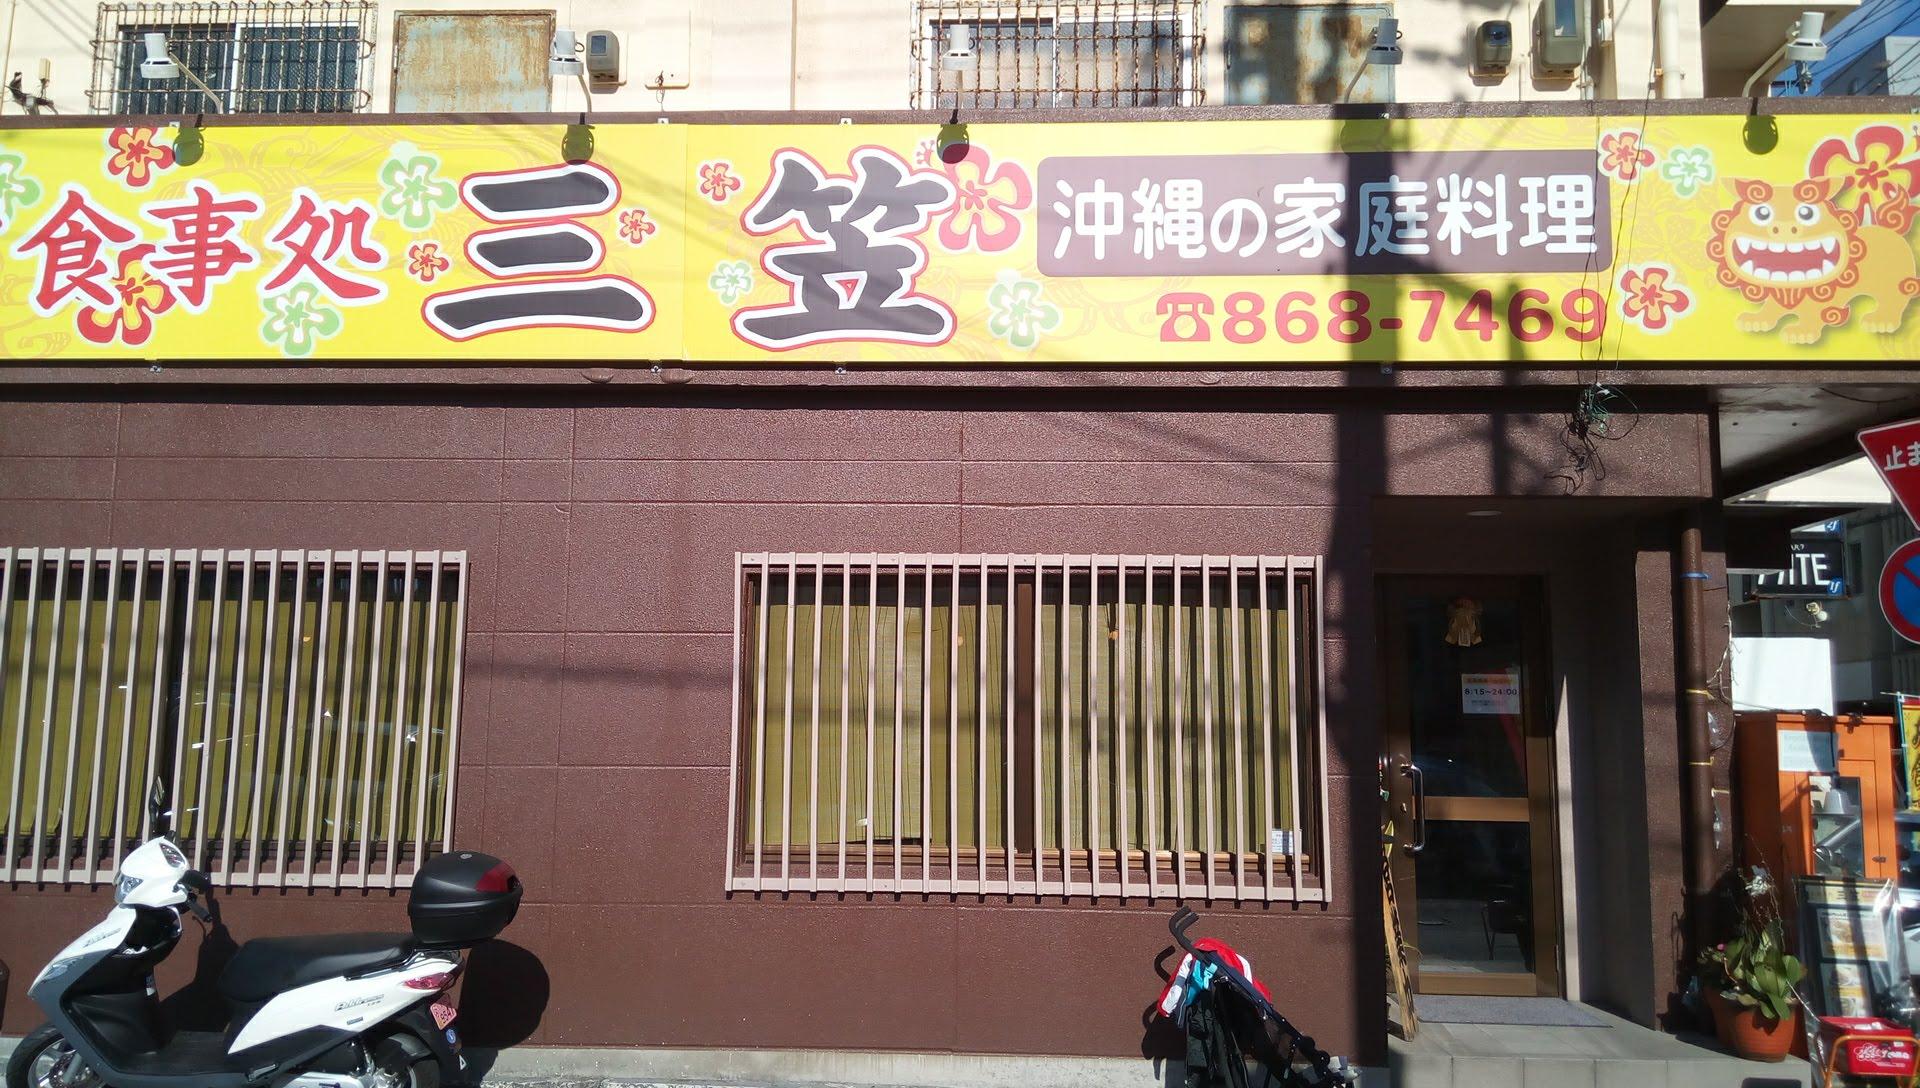 mikasa sushi and ramen